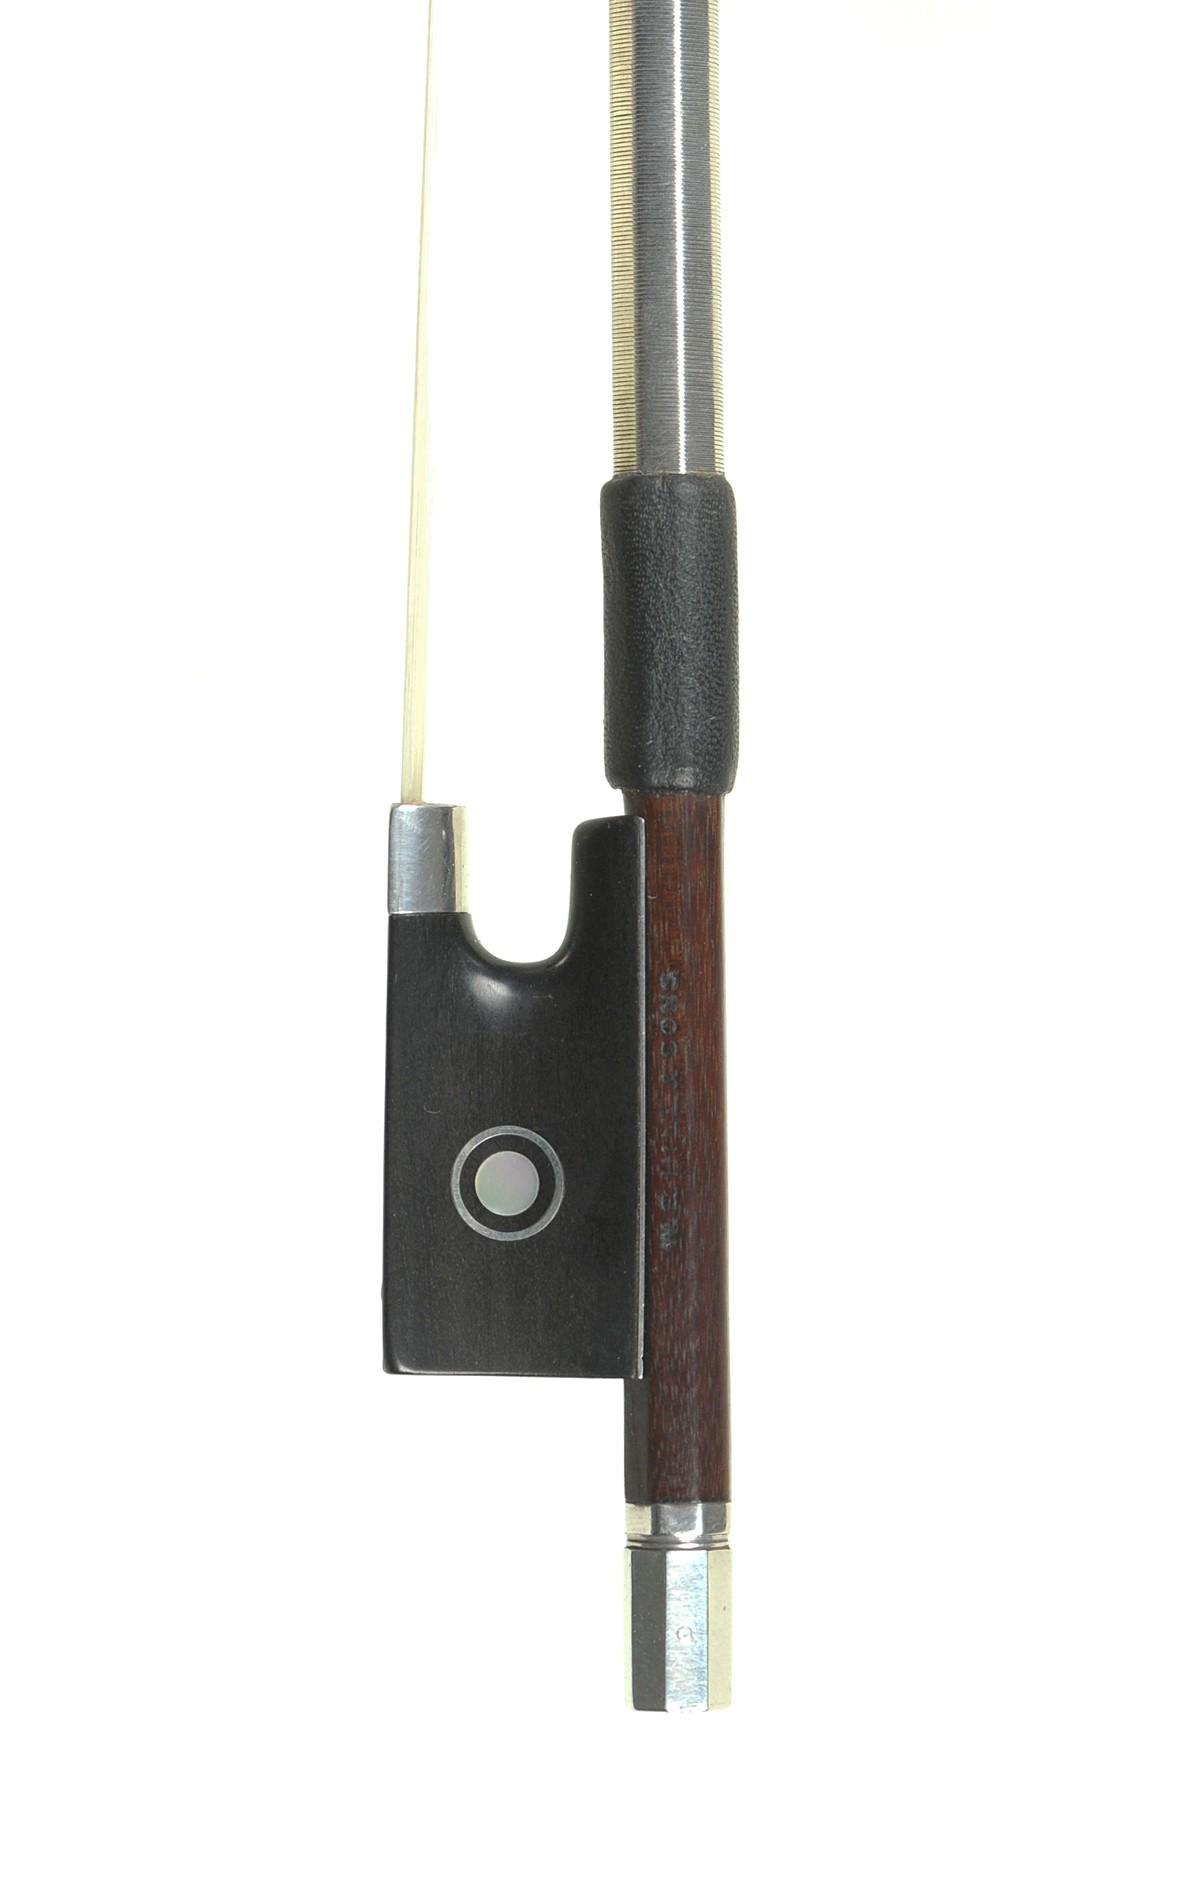 Fine W. E. Hill & Sons violin bow. Made by Chrles Leggatt / W. E. Hill & Sons, circa 1910 - frog